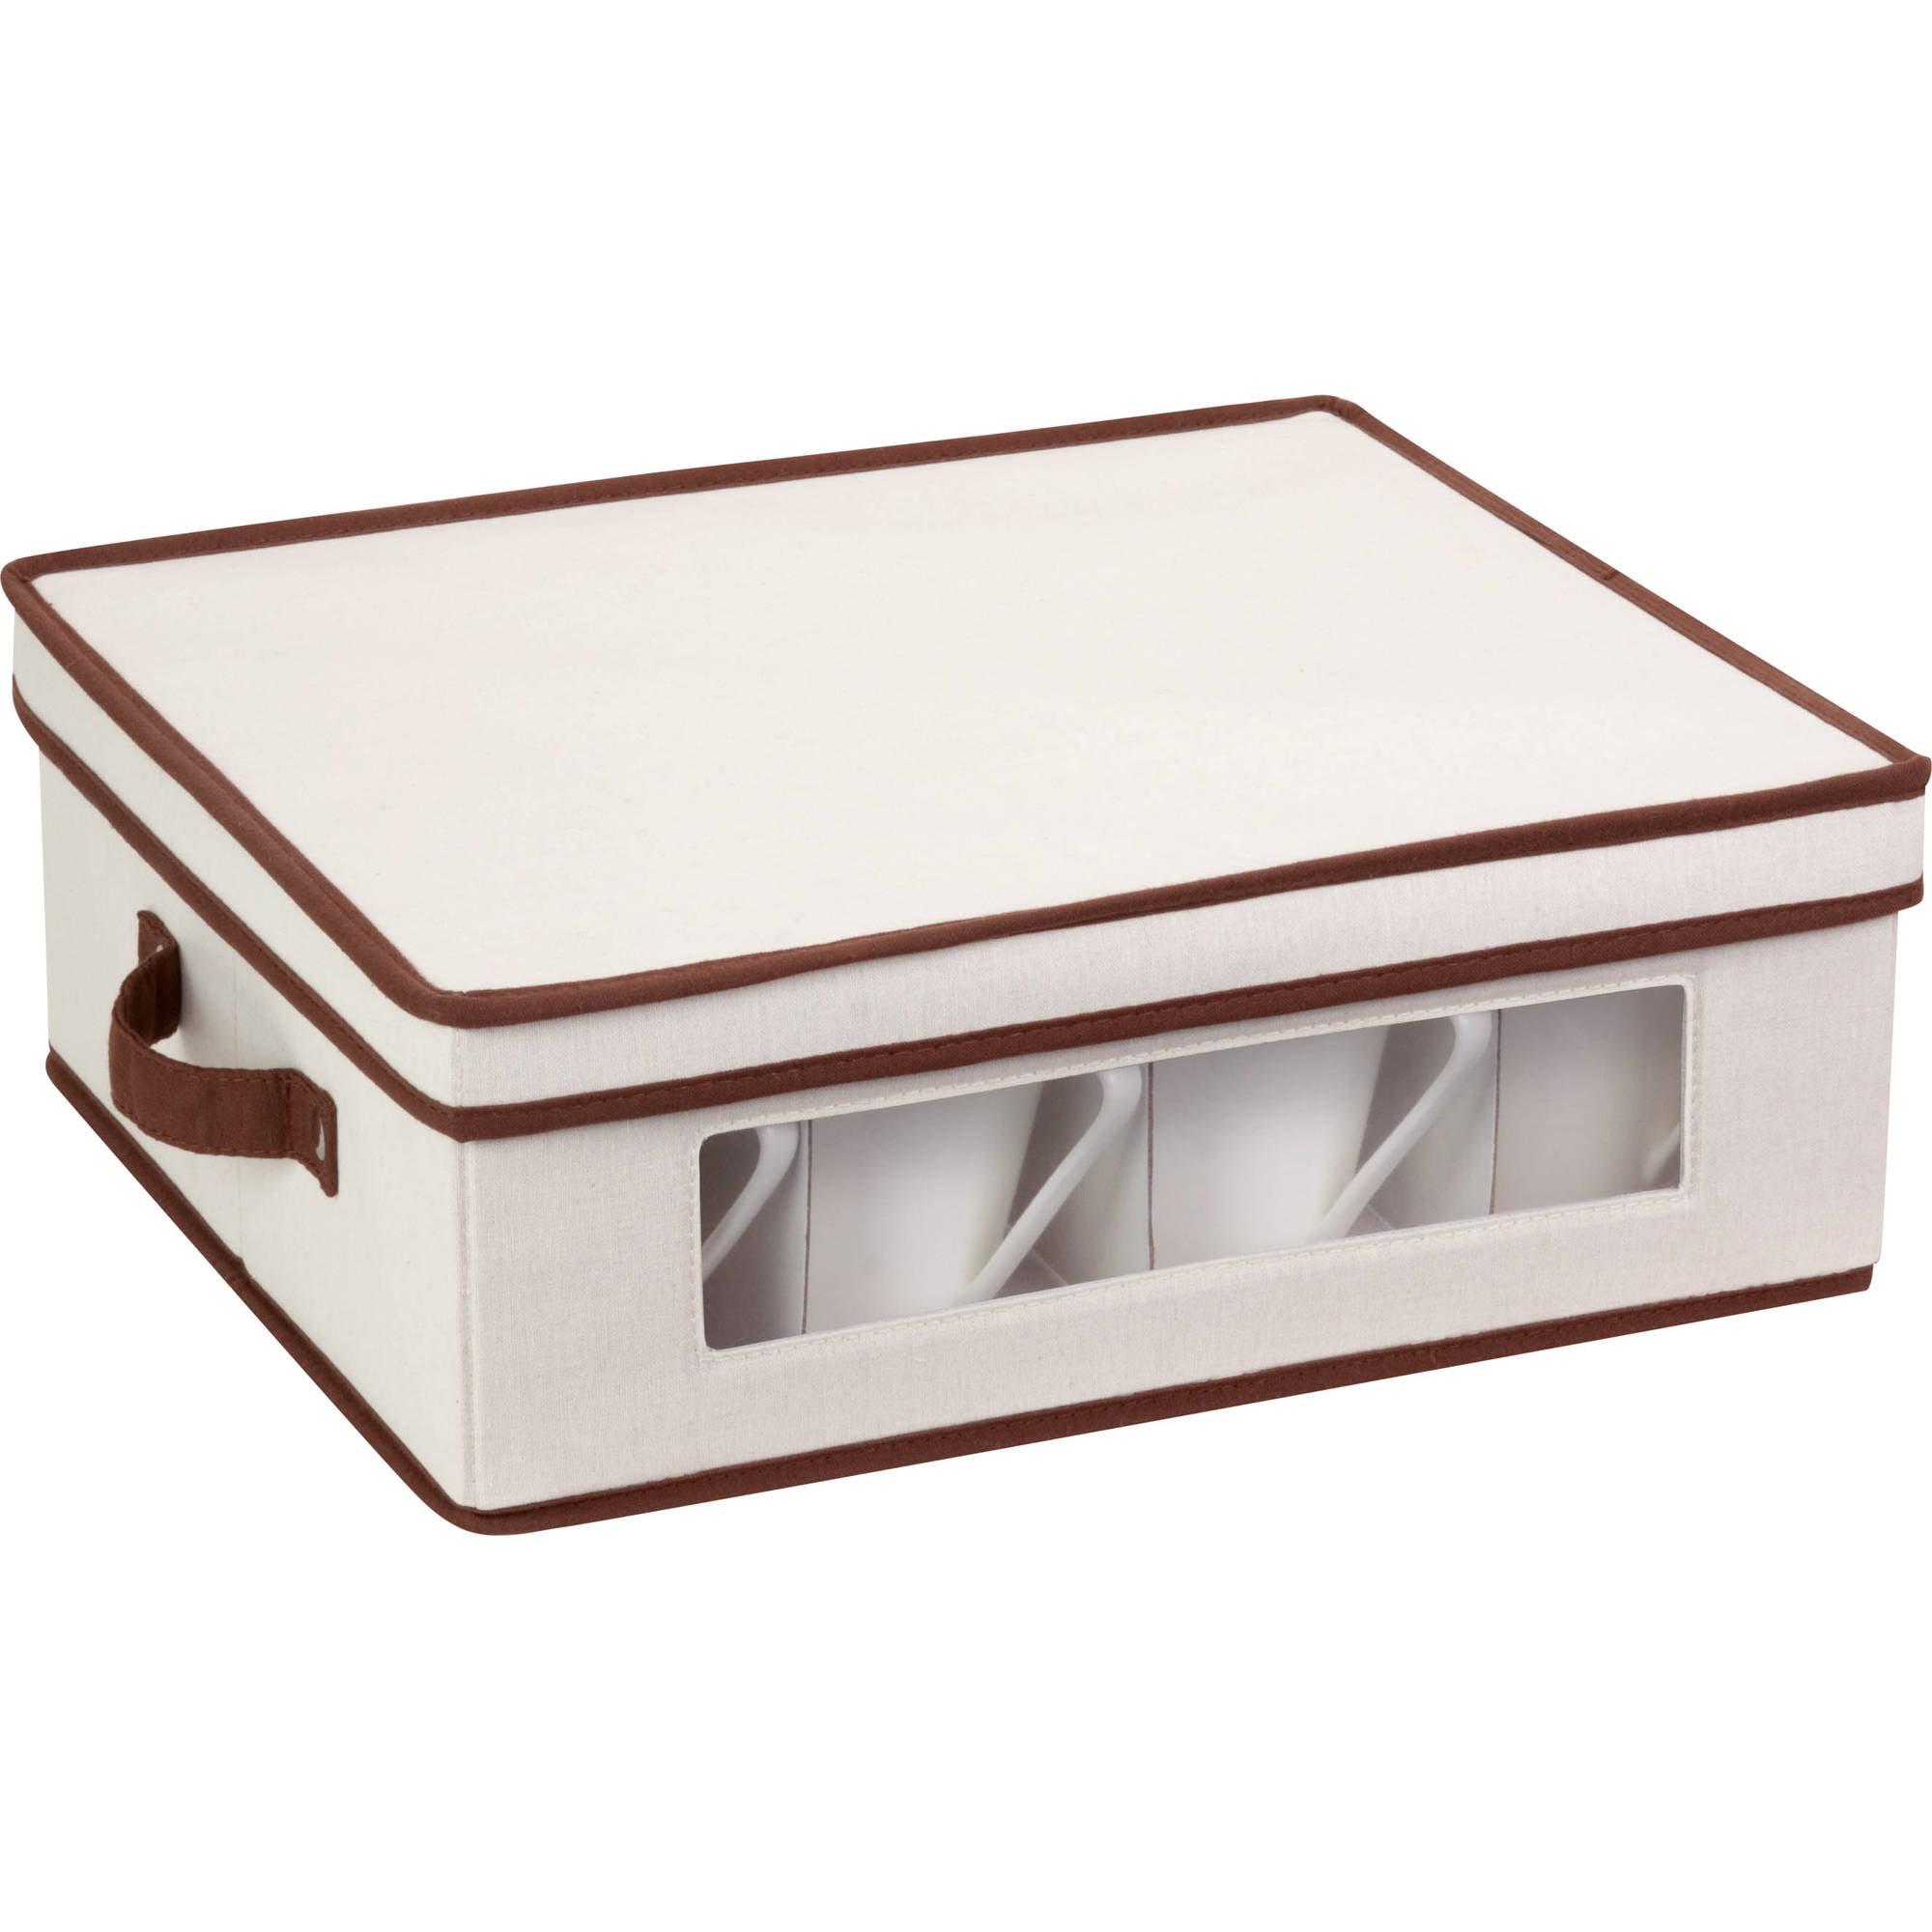 Honey Can Do Large 25lb Capacity Canvas Window Storage Box Beige/Brown - Walmart.com  sc 1 st  Walmart & Honey Can Do Large 25lb Capacity Canvas Window Storage Box Beige ...